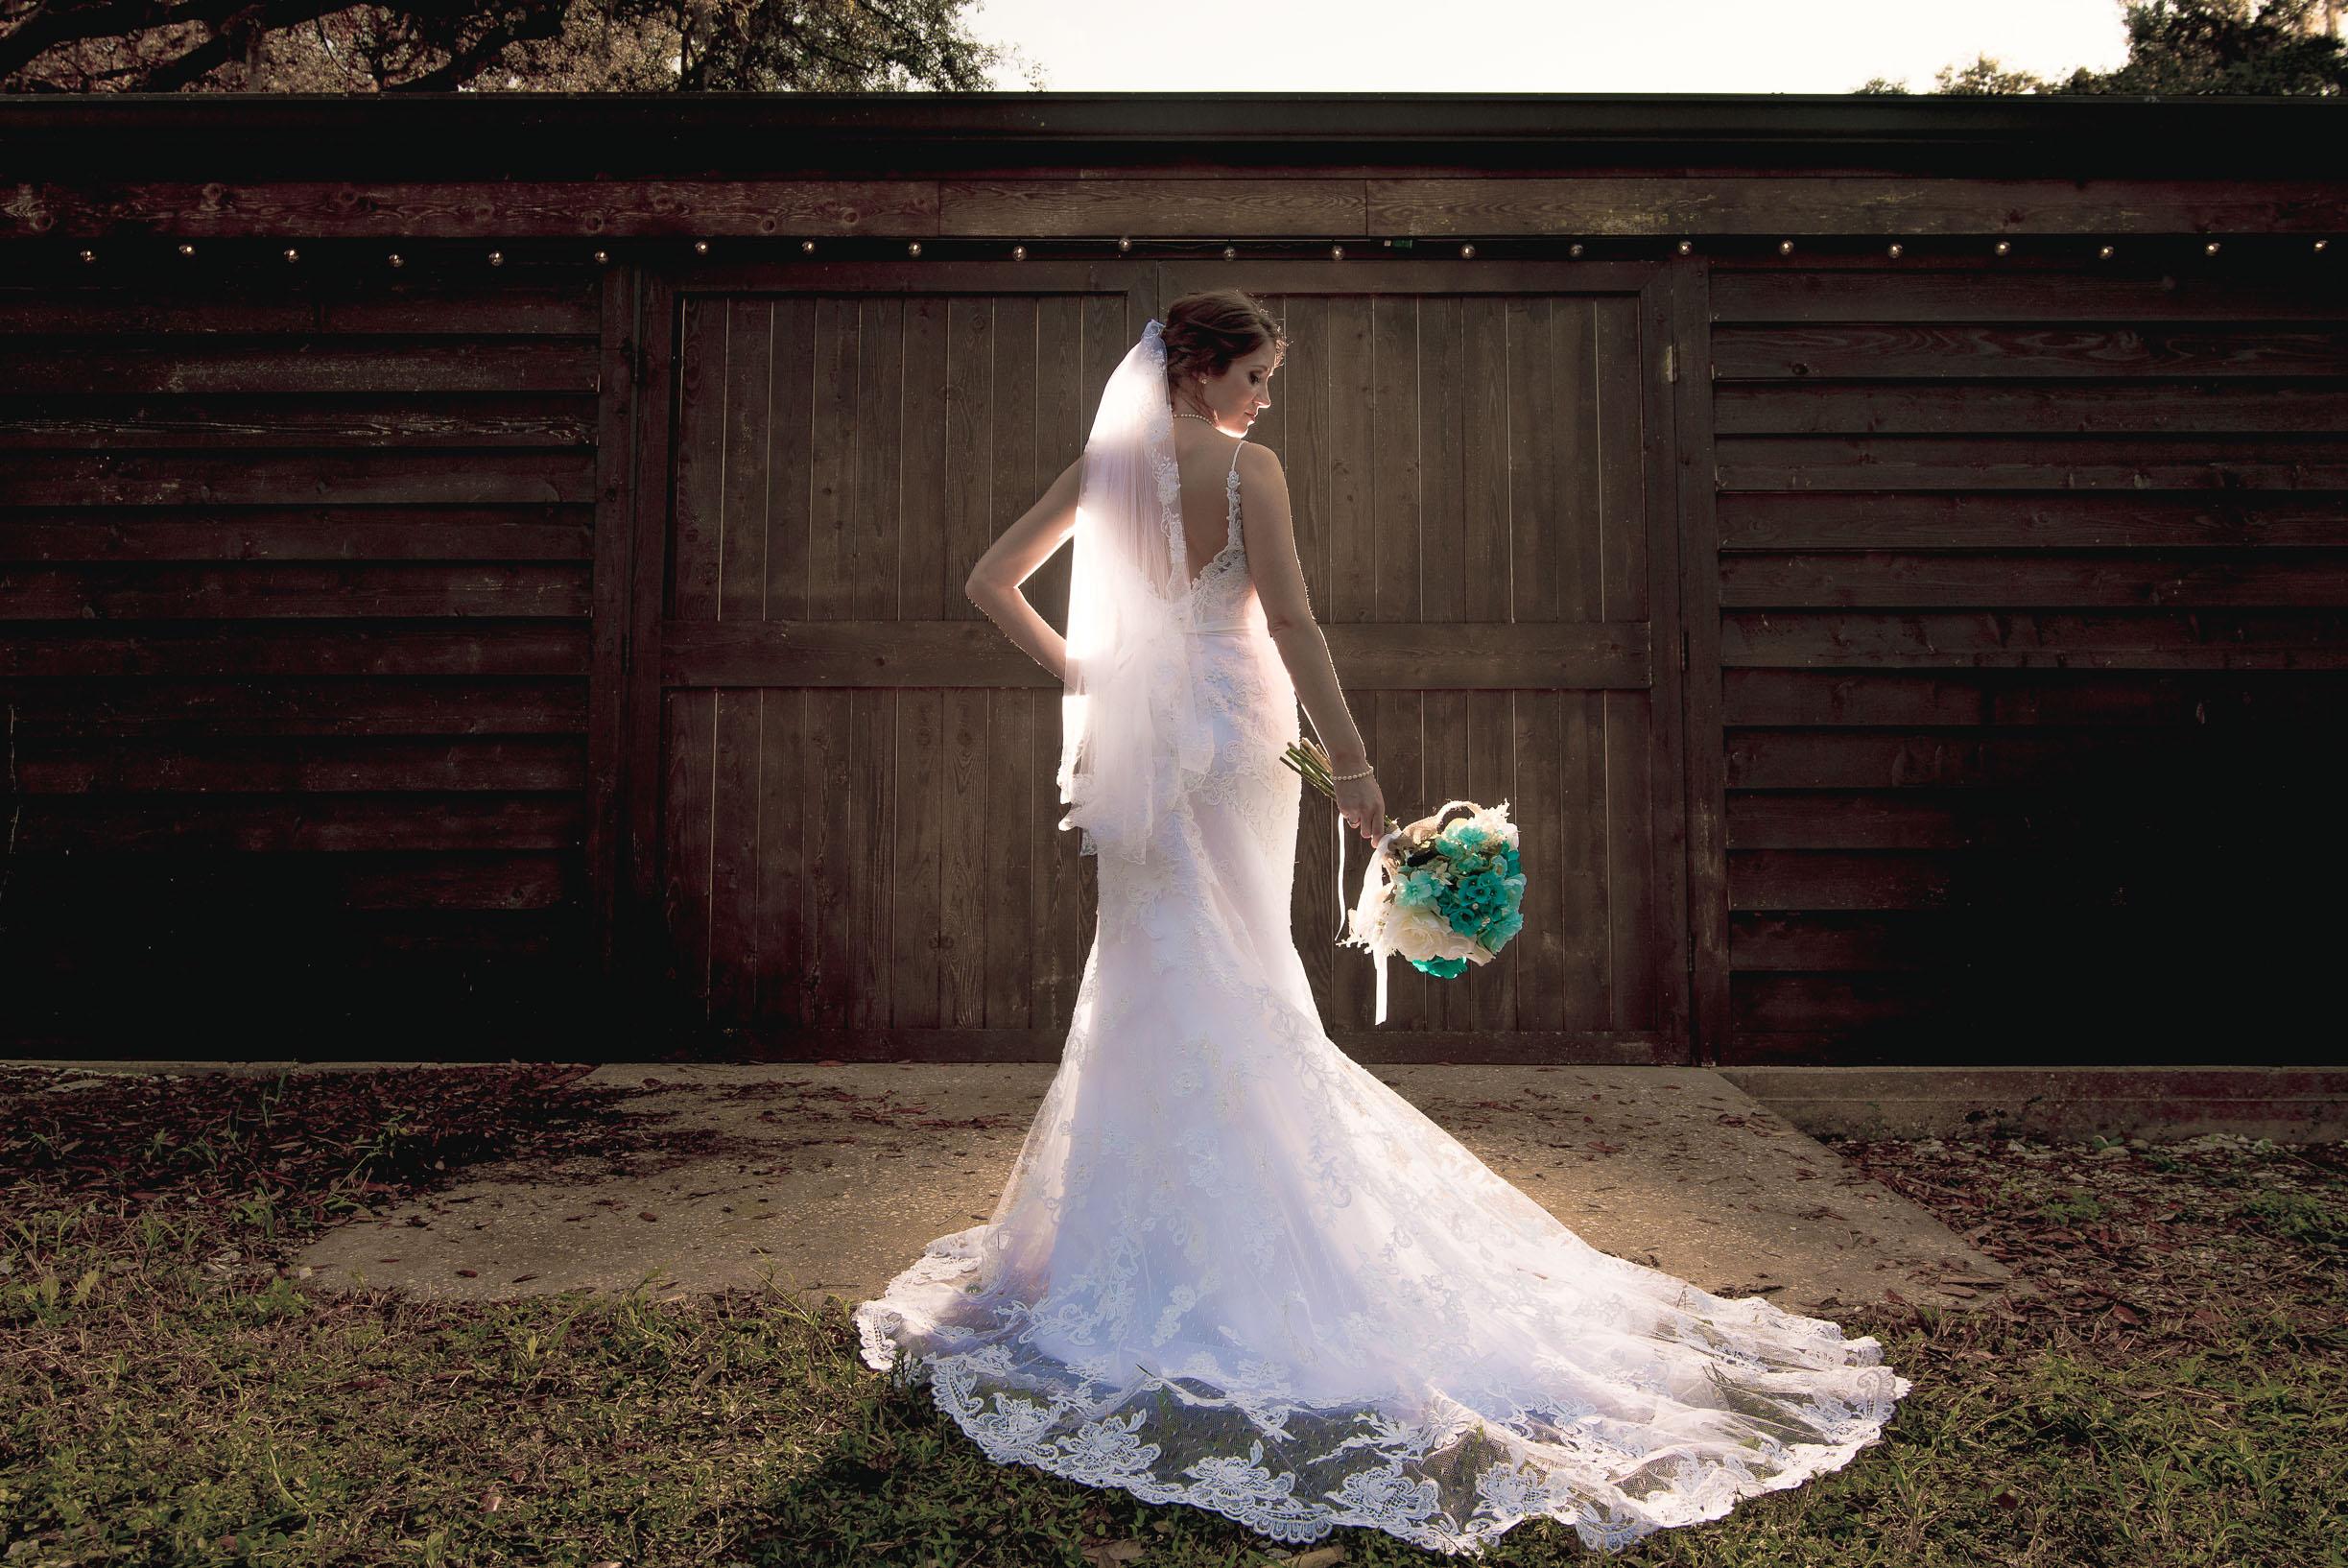 026Portland Wedding Photographer timothy capp.jpg